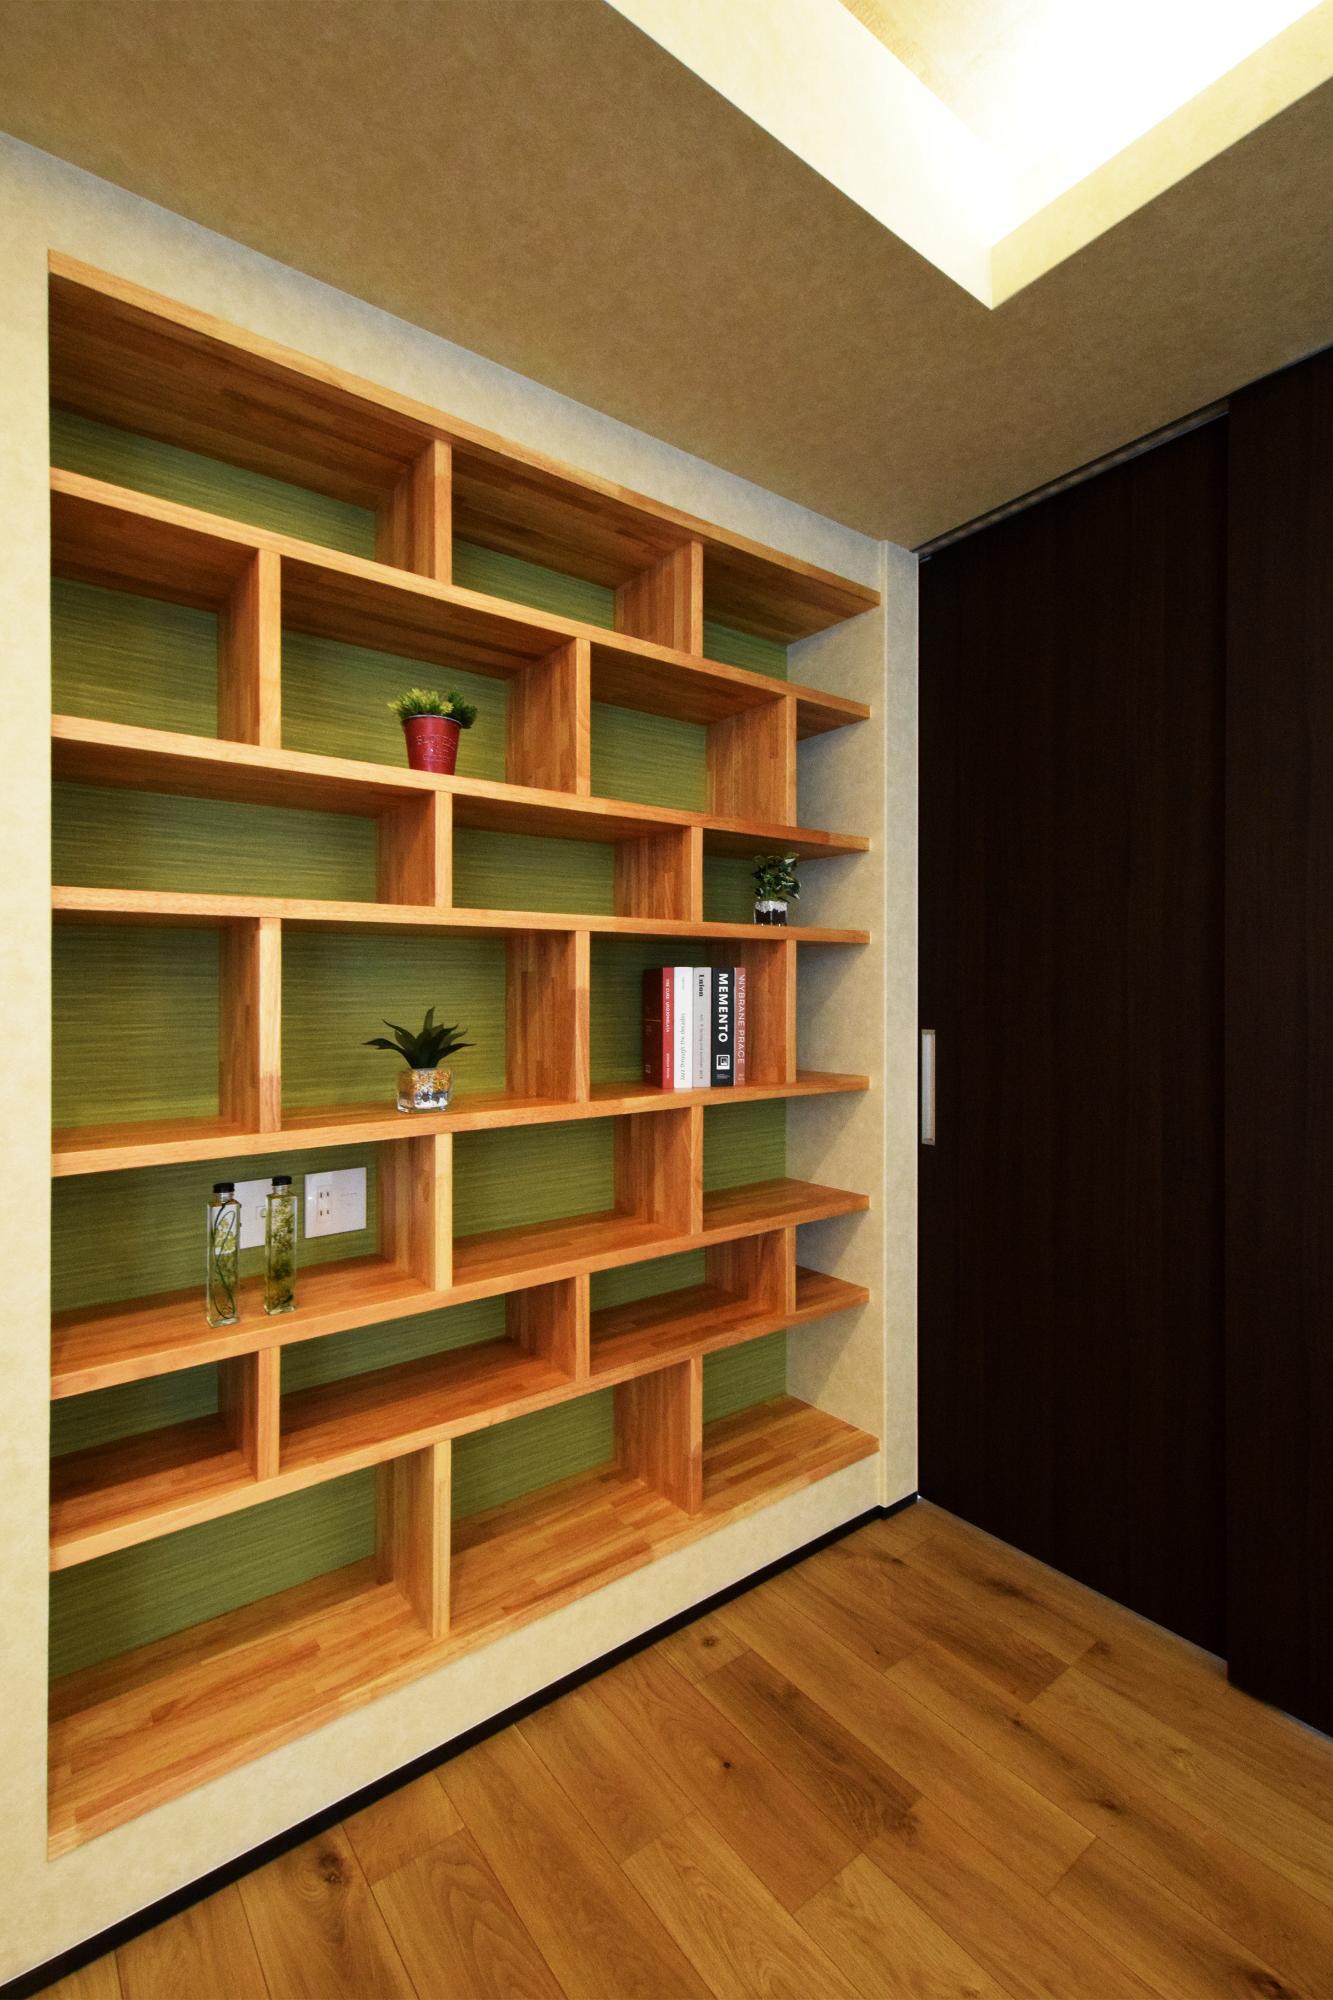 DETAIL HOME(ディテールホーム)「二世帯で住まう和モダン平屋住宅」のモダン・和風・和モダンな収納スペースの実例写真